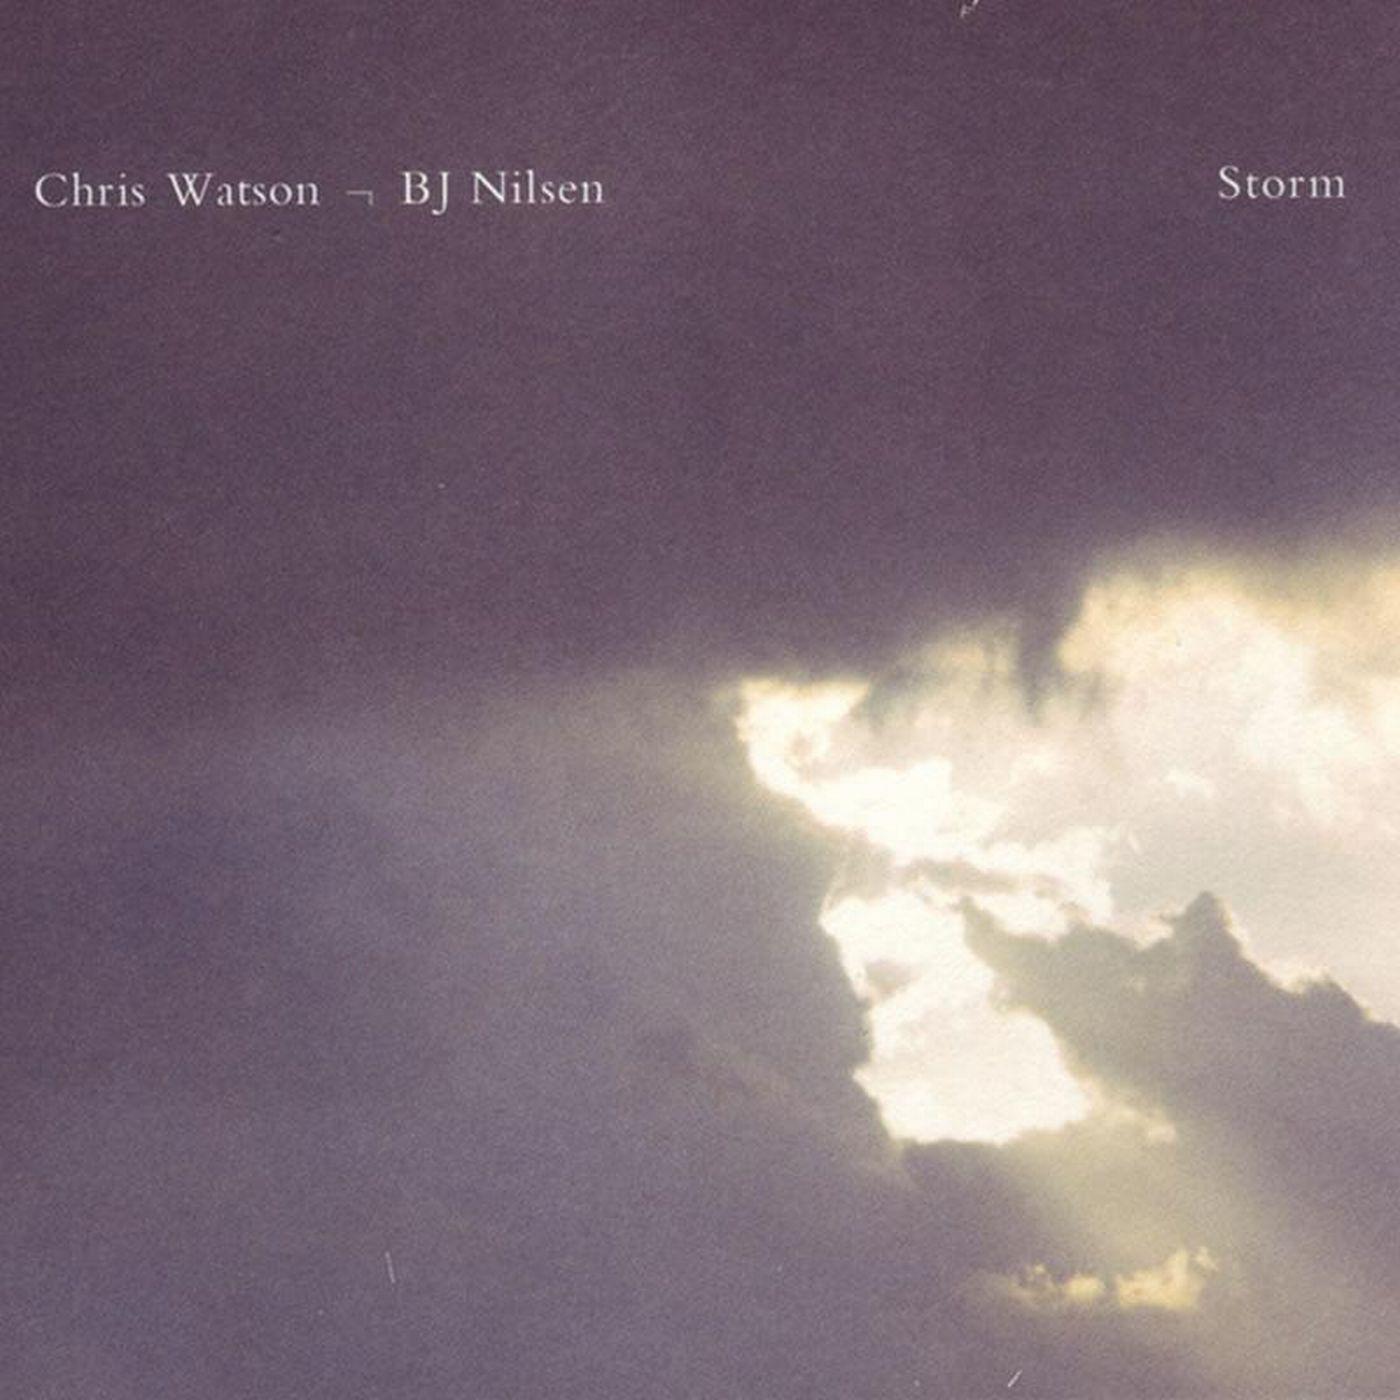 TONE27 - Storm - Chris Watson BJNilsen